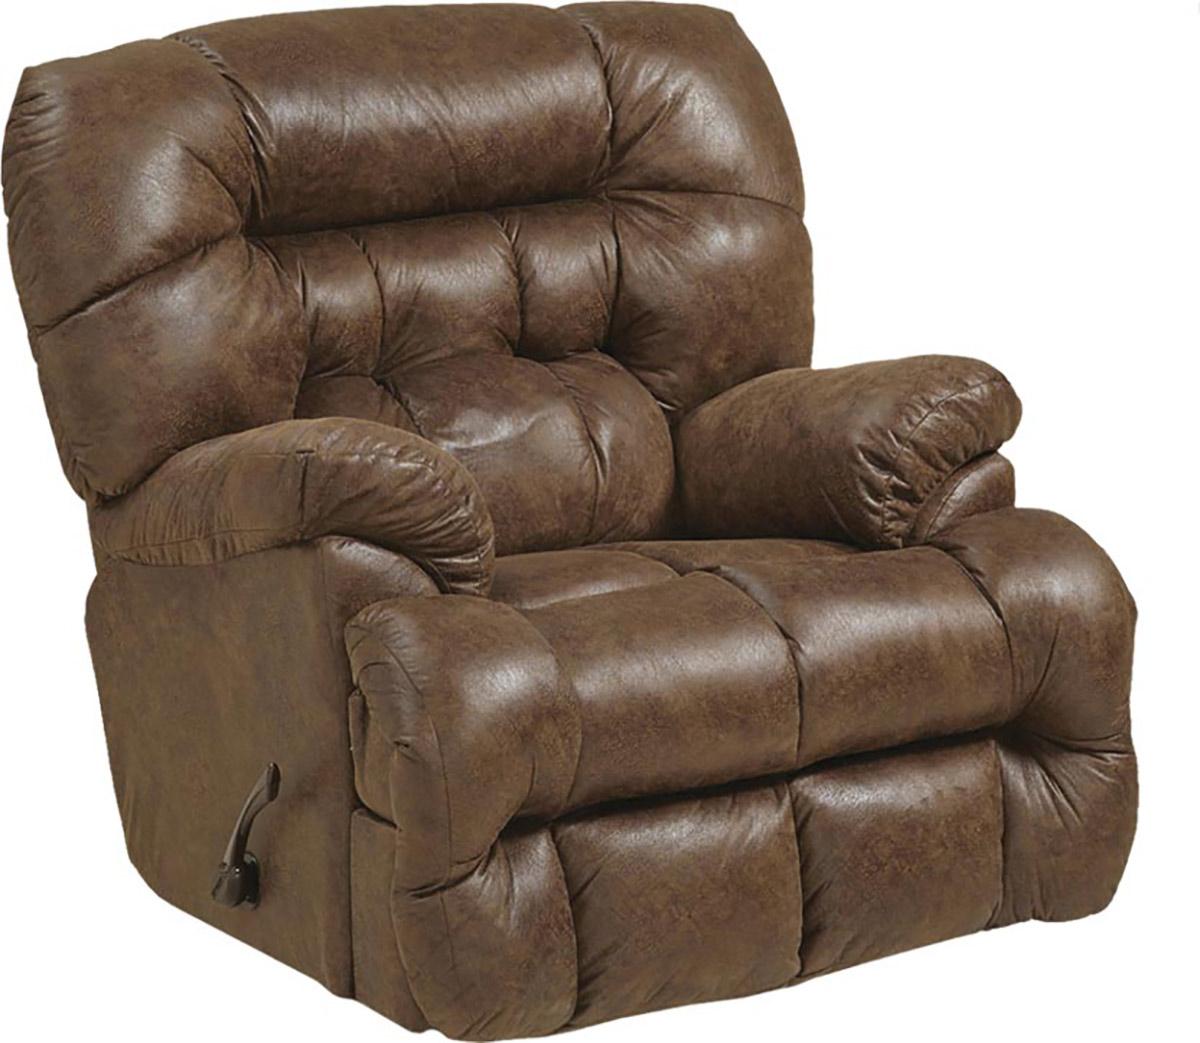 CatNapper Colson Chaise Rocker Recliner Chair - Canyon